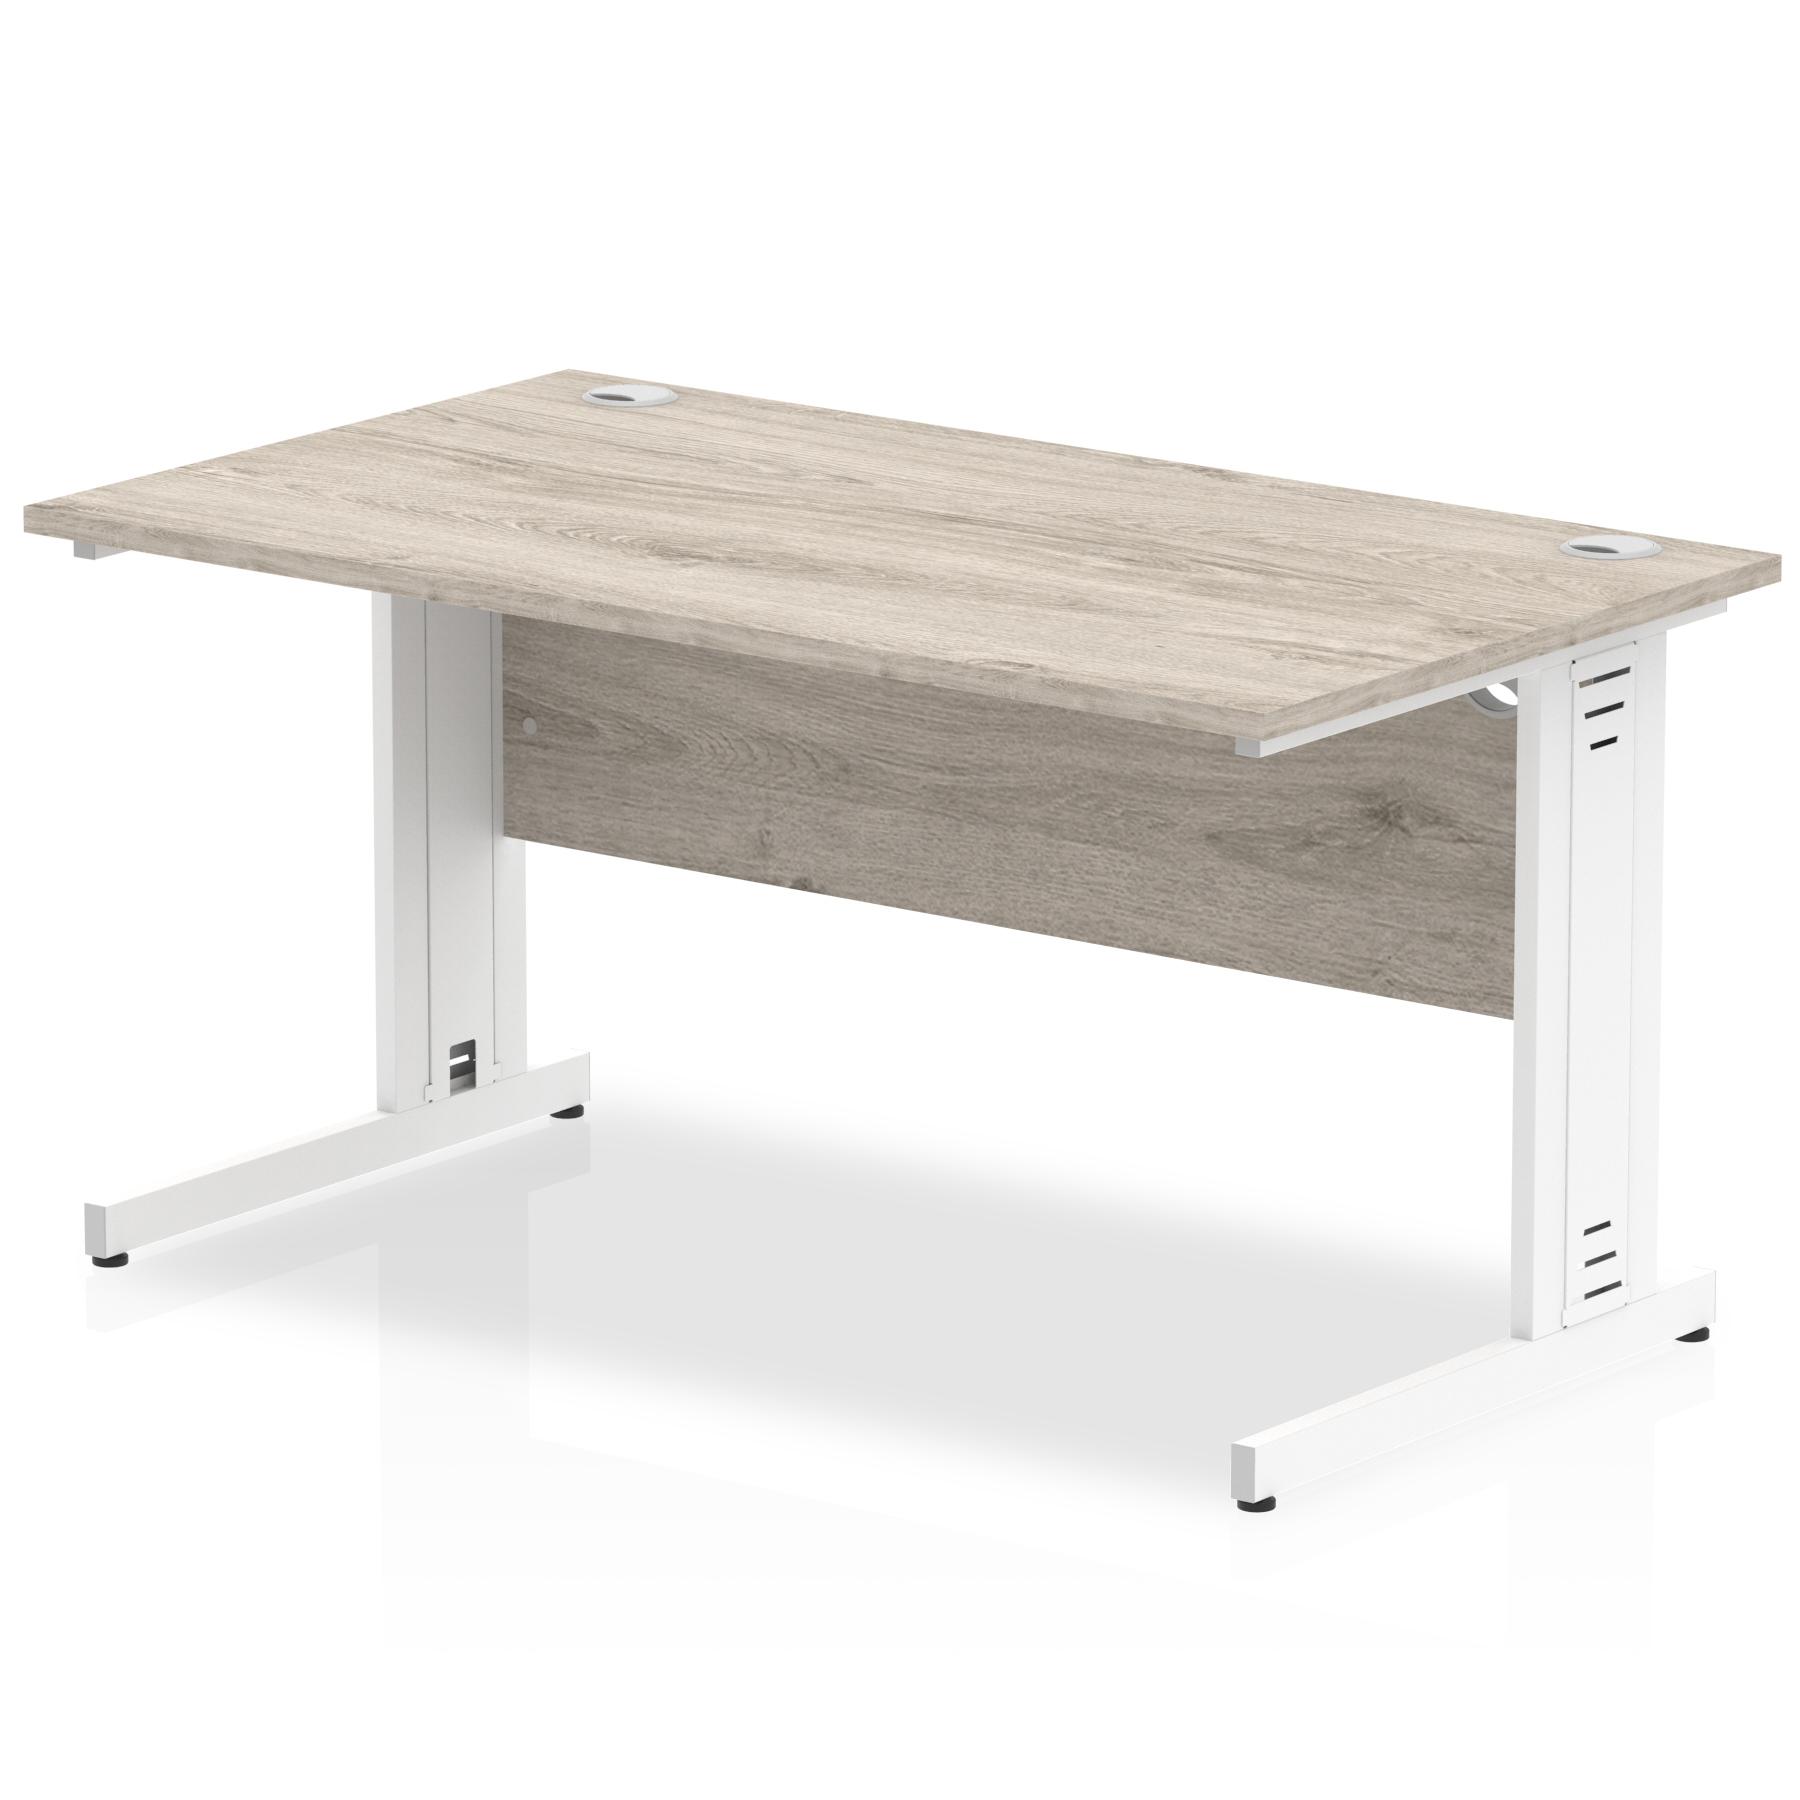 Trexus Rectangular Desk White Cable Managed Leg 1200x800mm Grey Oak Ref I003101